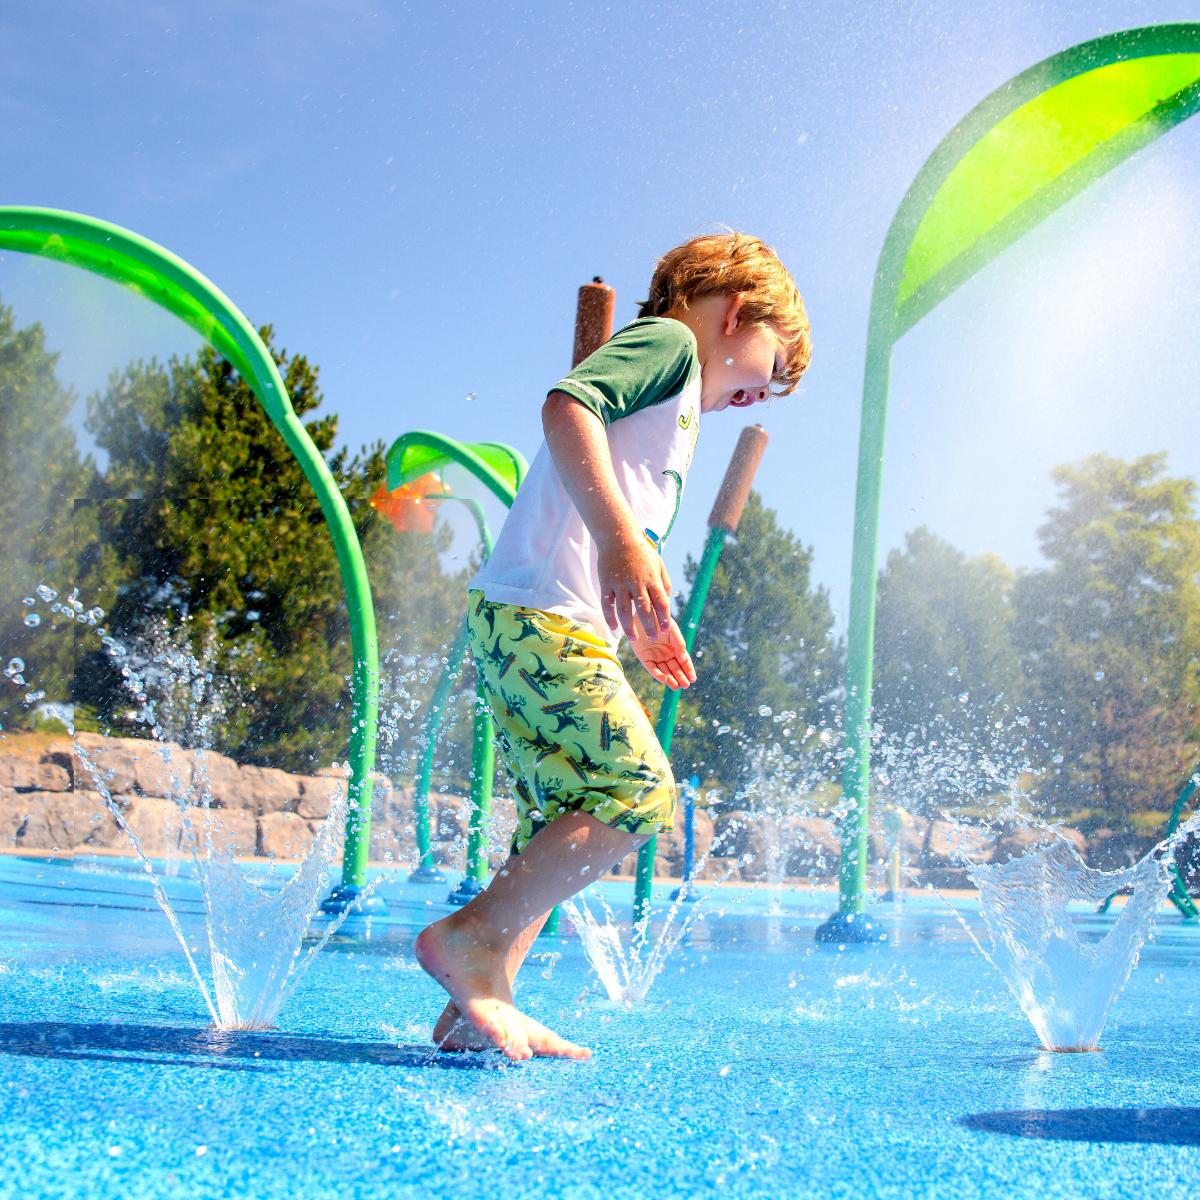 A young boy plays at the MacBain Centre splash pad.